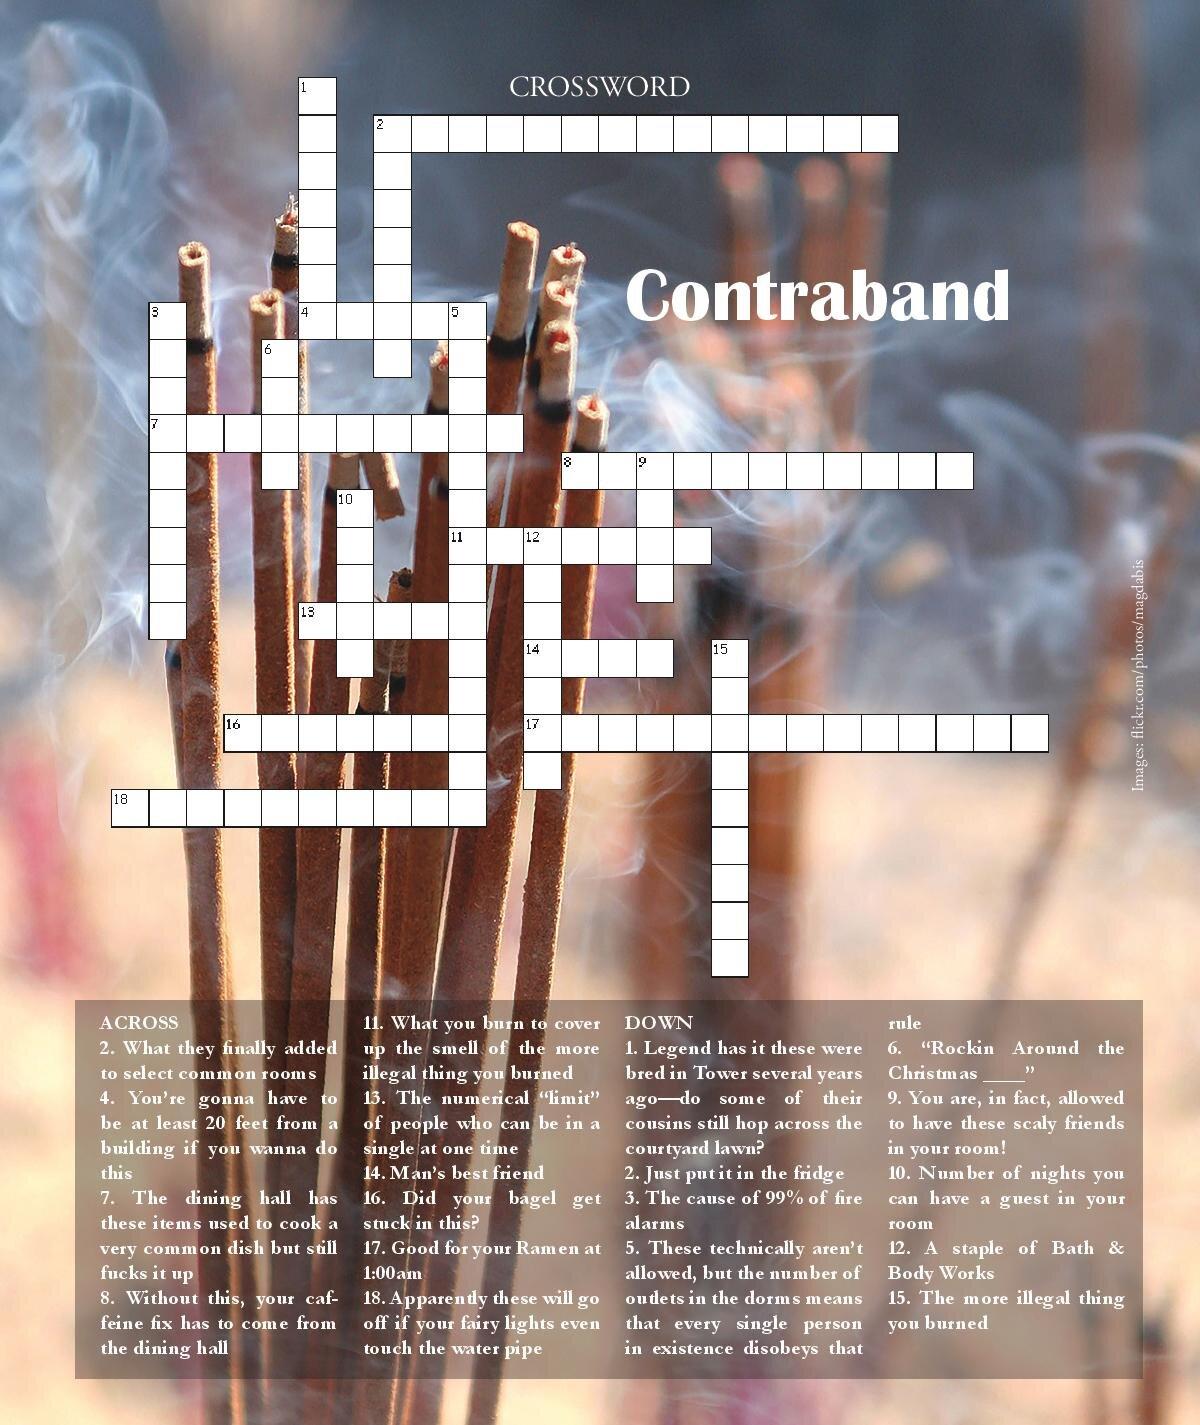 September 2019: Contraband